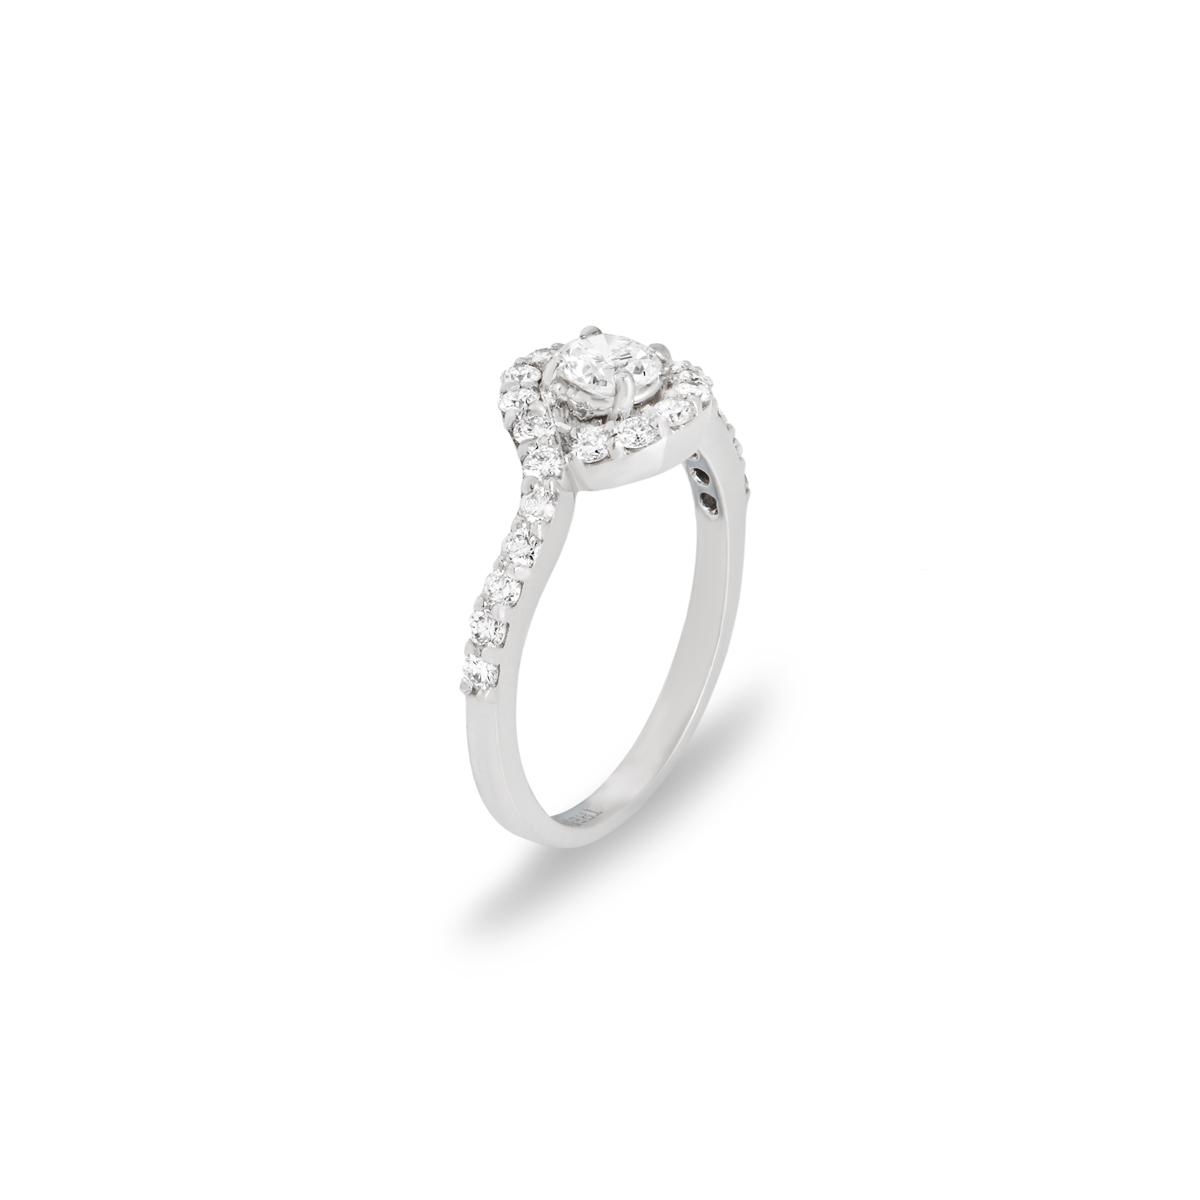 18k White Gold Round Brilliant Cut Diamond Ring 0.38ct H/VS1